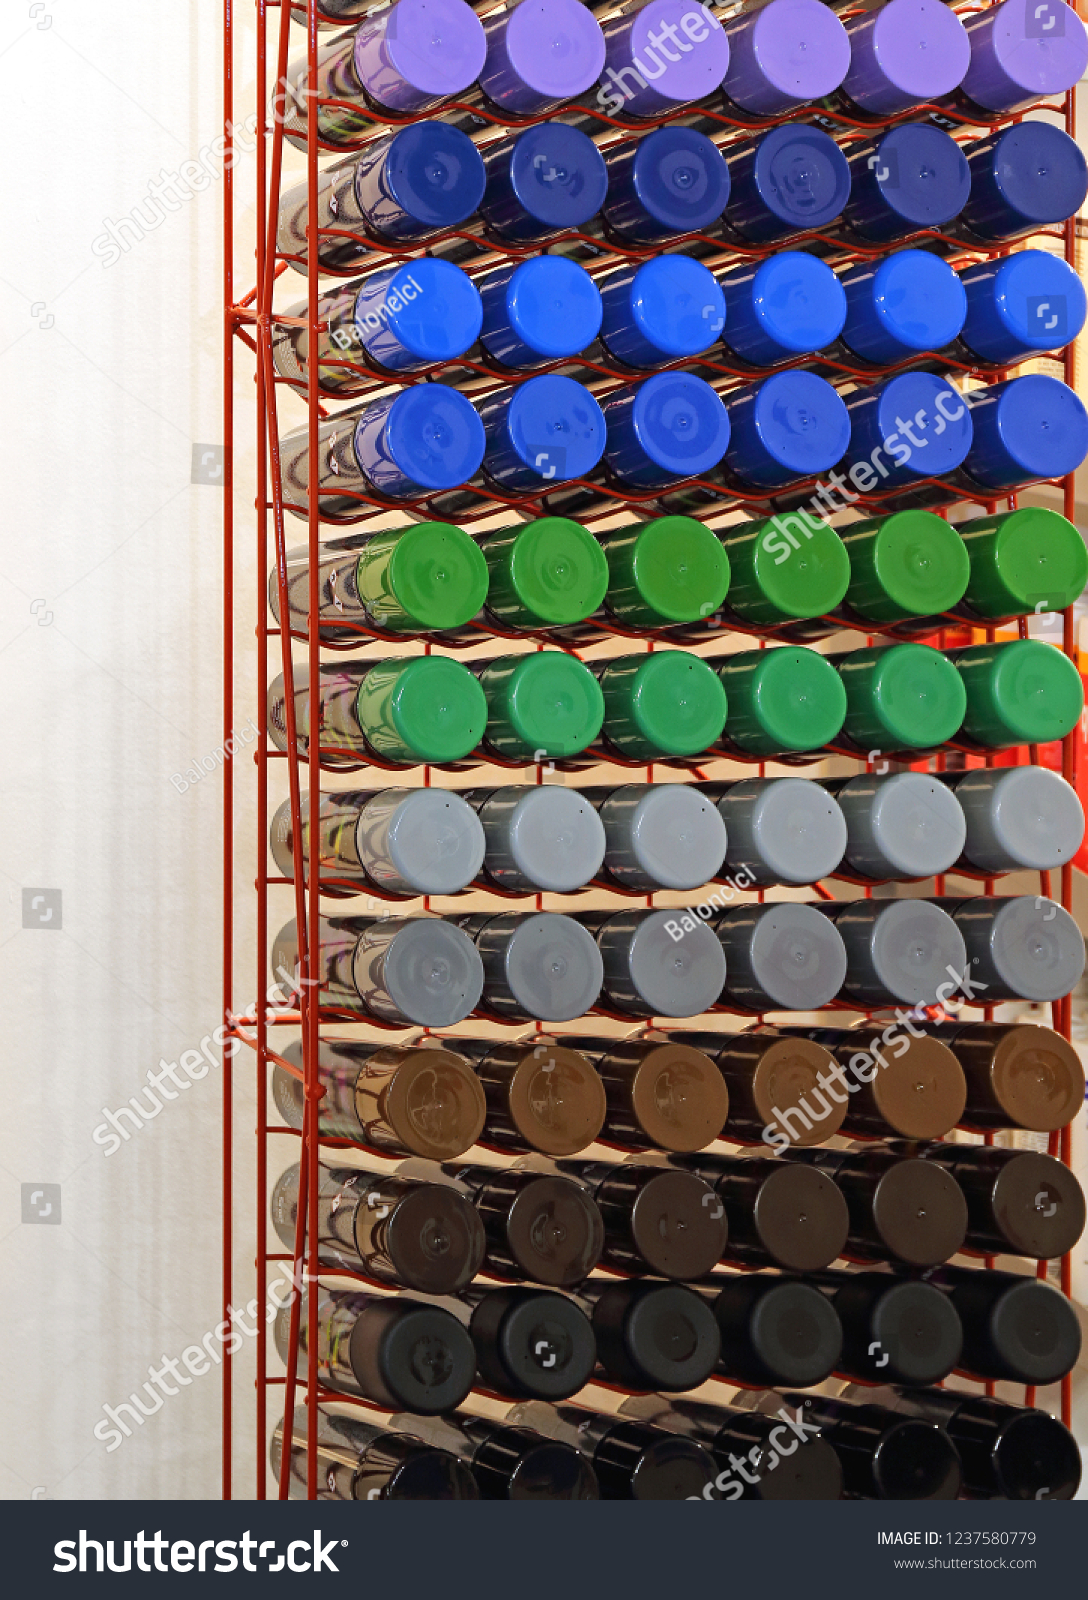 Cans Aerosol Spray Paint Many Colors Stockfoto Jetzt Bearbeiten